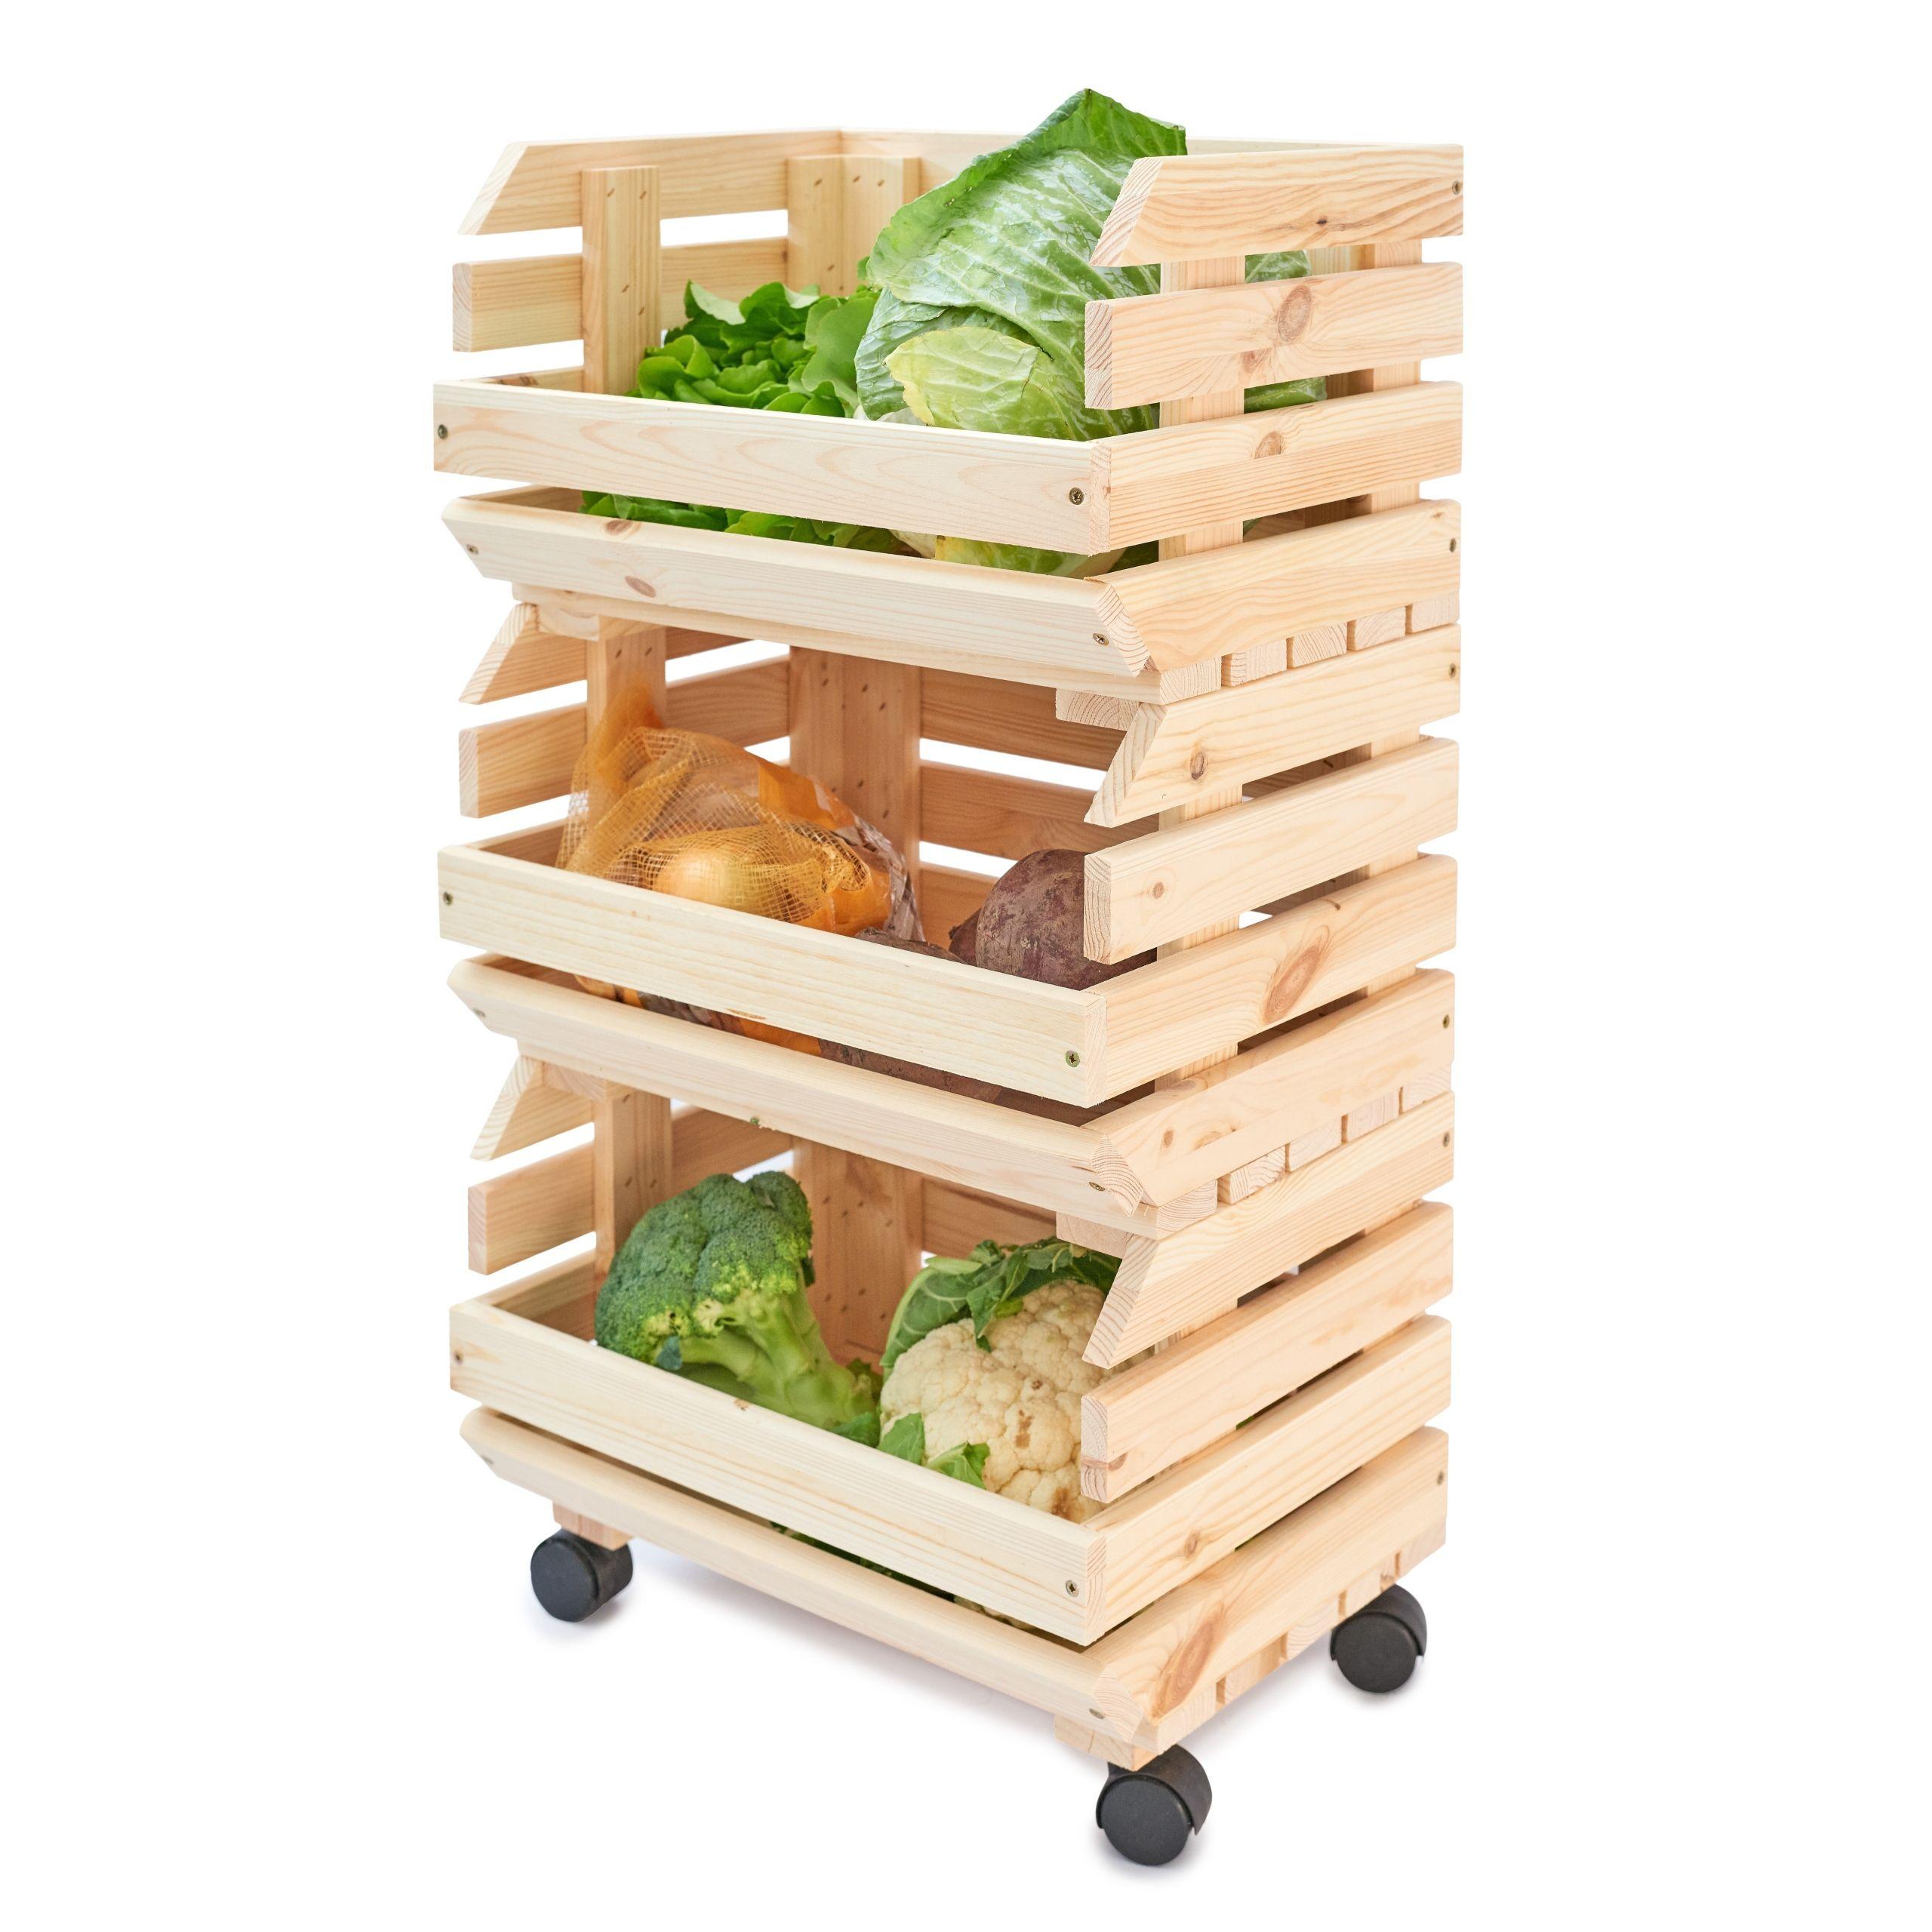 Pin By Ania S On Pomieszczenia Vegetable Rack Home Decor Wood Design